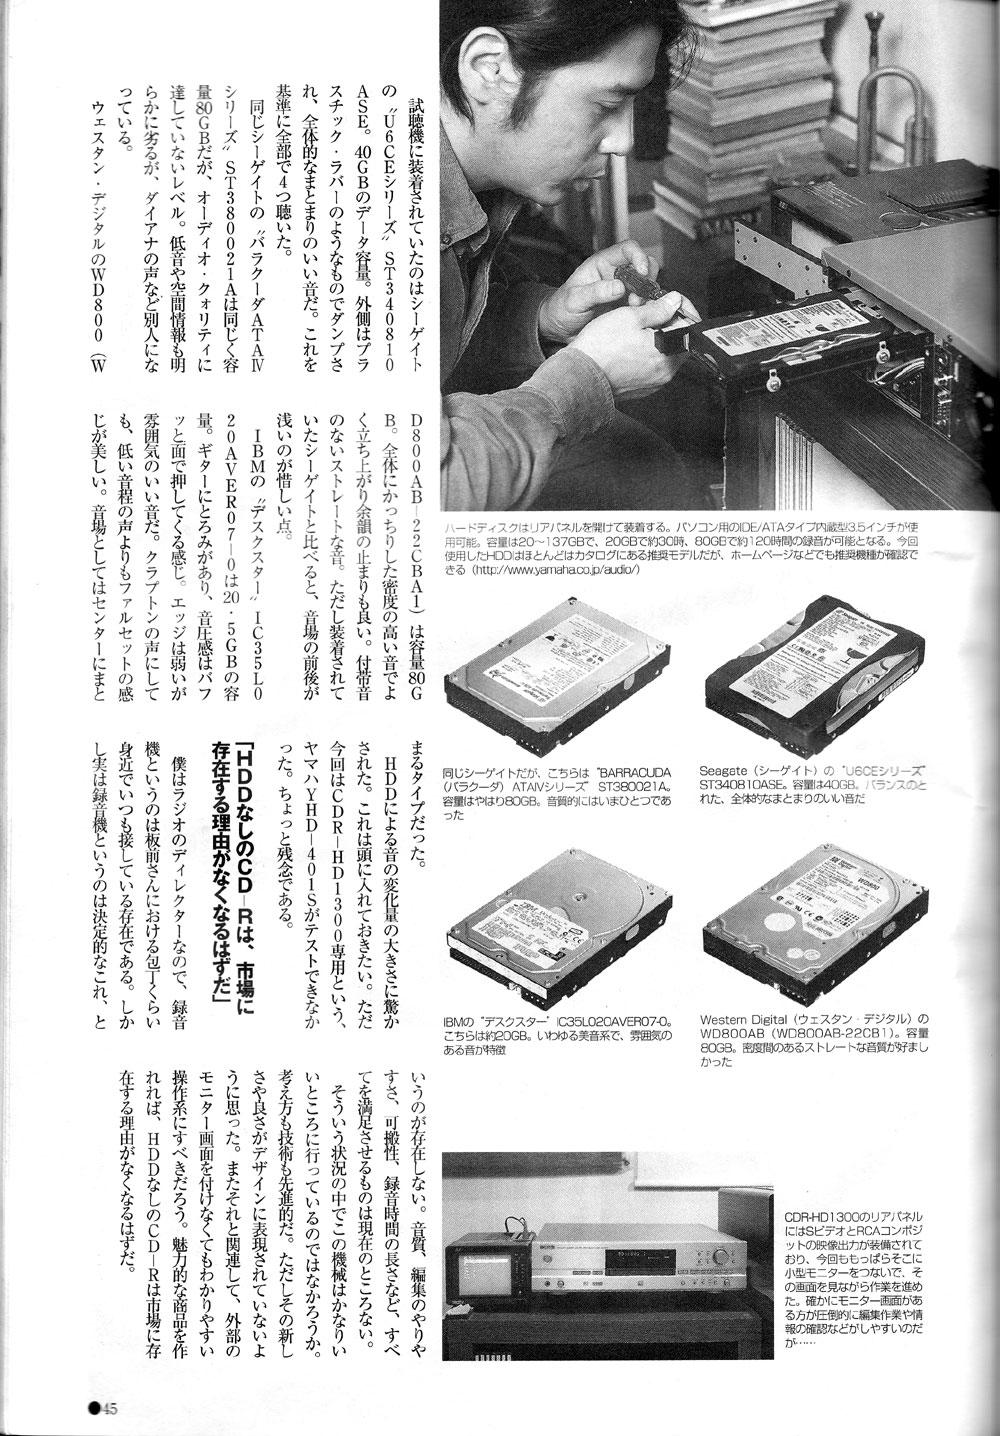 http://image.blog.livedoor.jp/dqnplus/imgs/9/7/975a0bd4.jpg